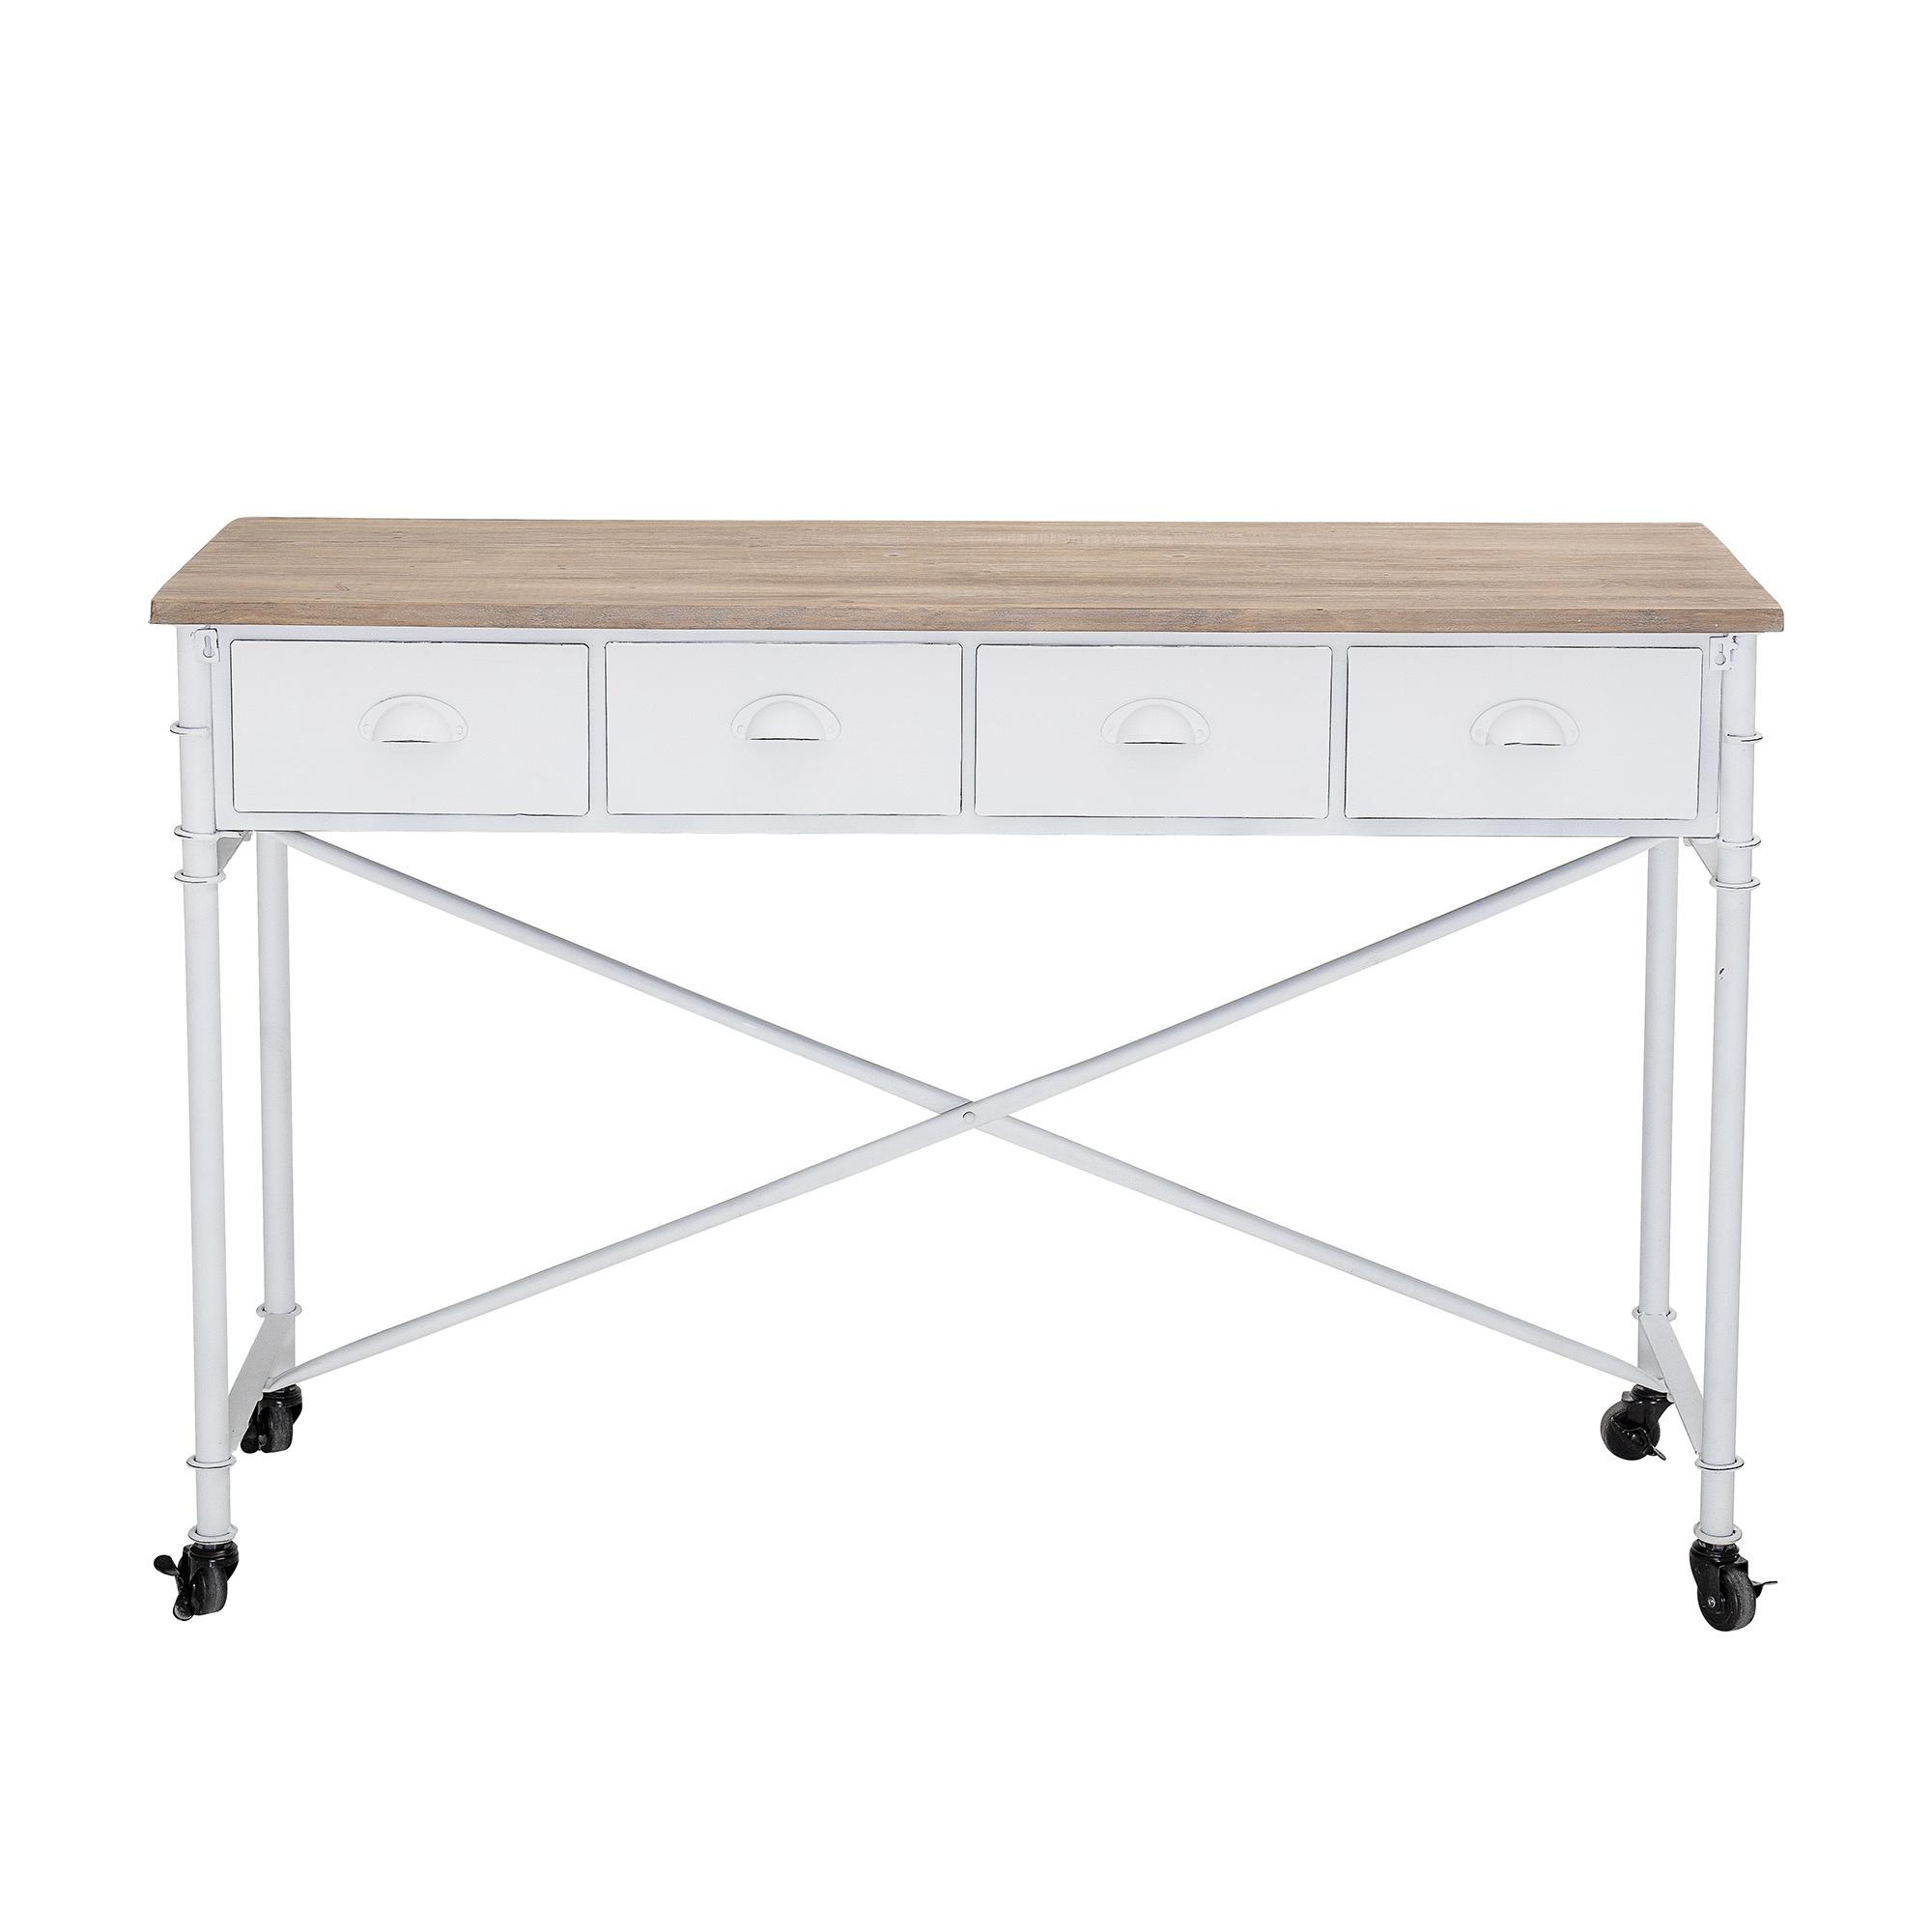 Evenaar Bureau  / console métal - blanc / naturel - L120xH80xW40cm - Bloomingville